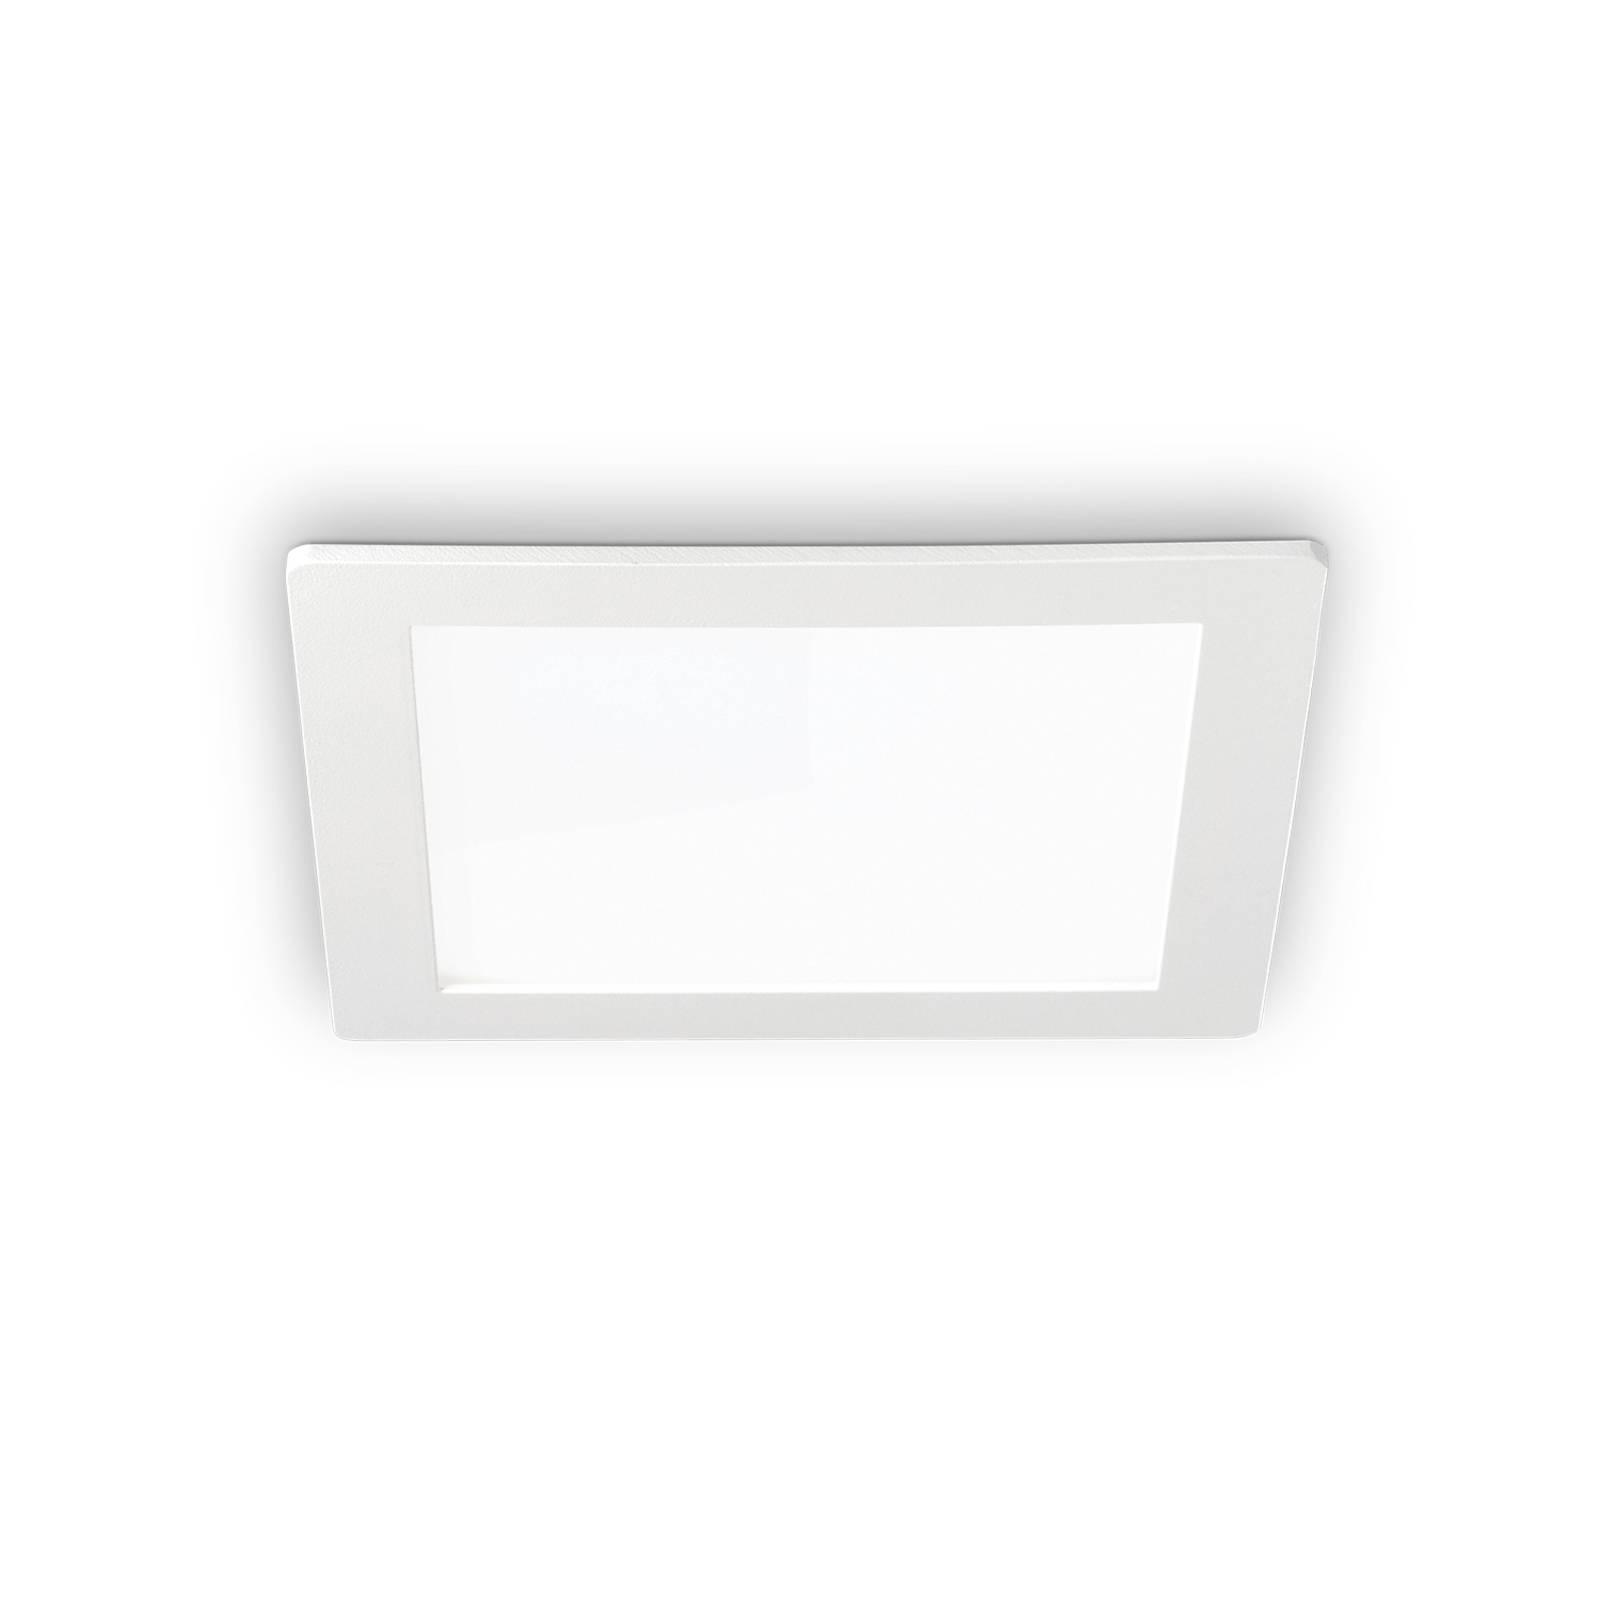 LED-kattouppovalaisin Groove square 11,8 x 11,8 cm